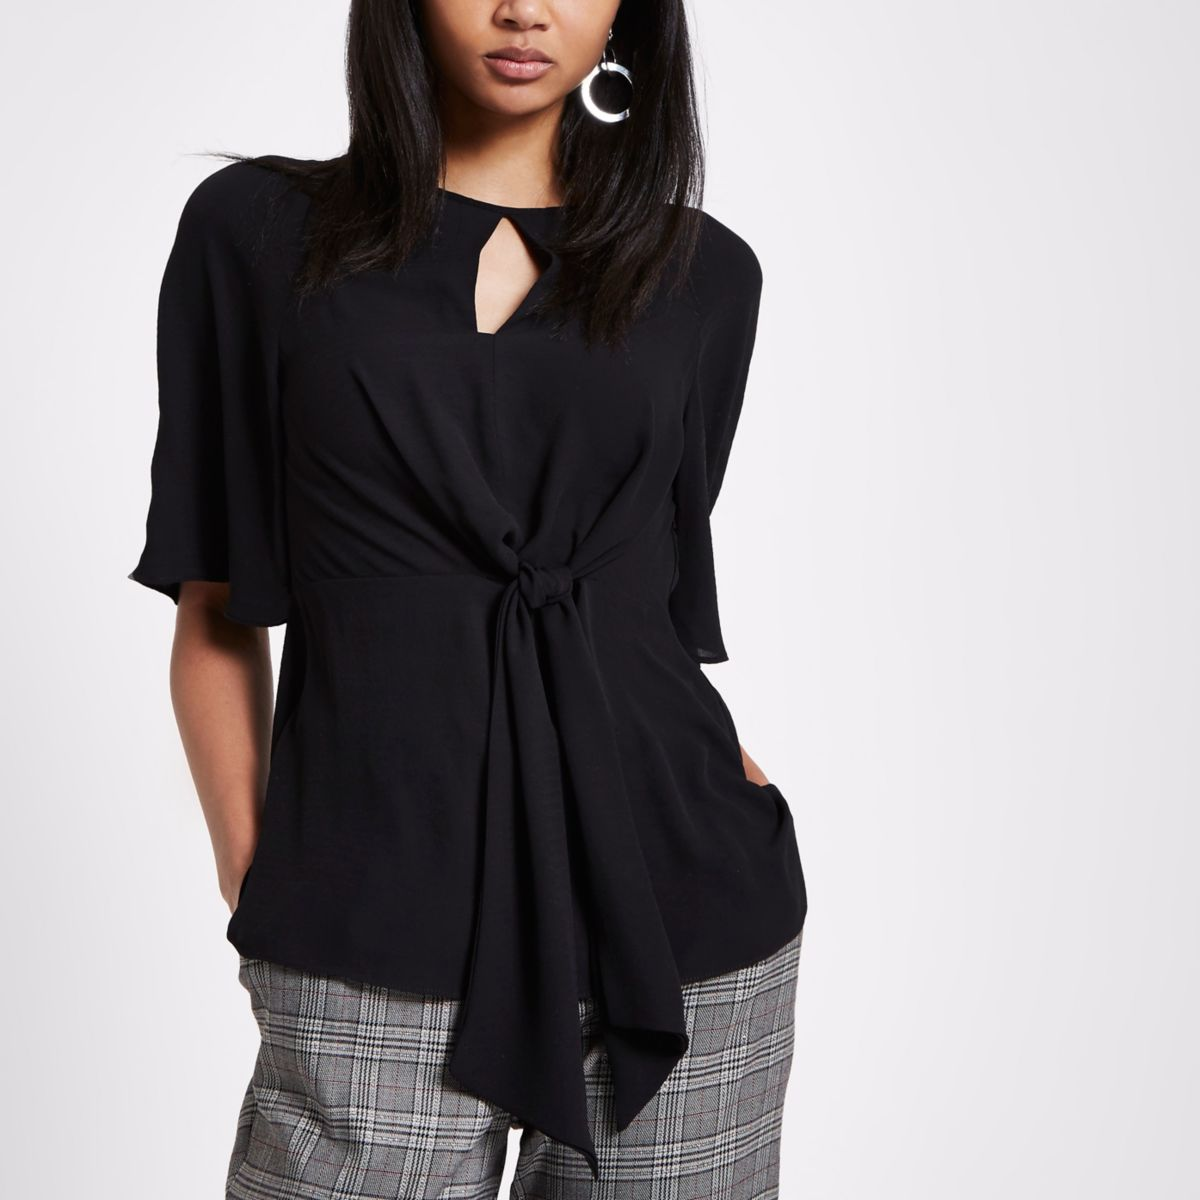 Schwarze, kurzärmlige Bluse